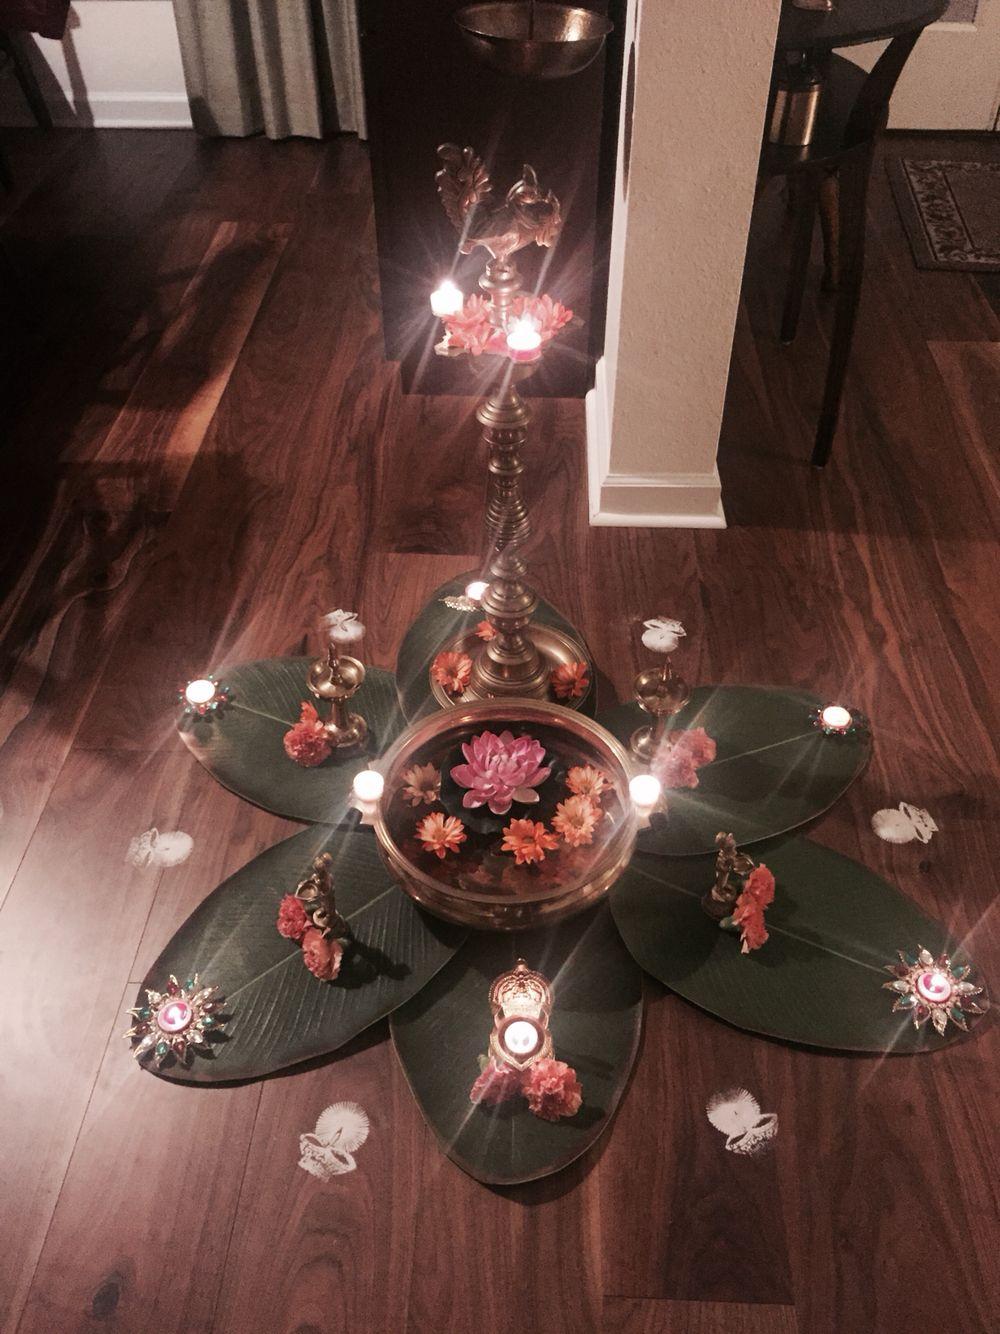 Wedding decorations for house  Diwali decorations  Deepavali  Pinterest  Diwali decorations